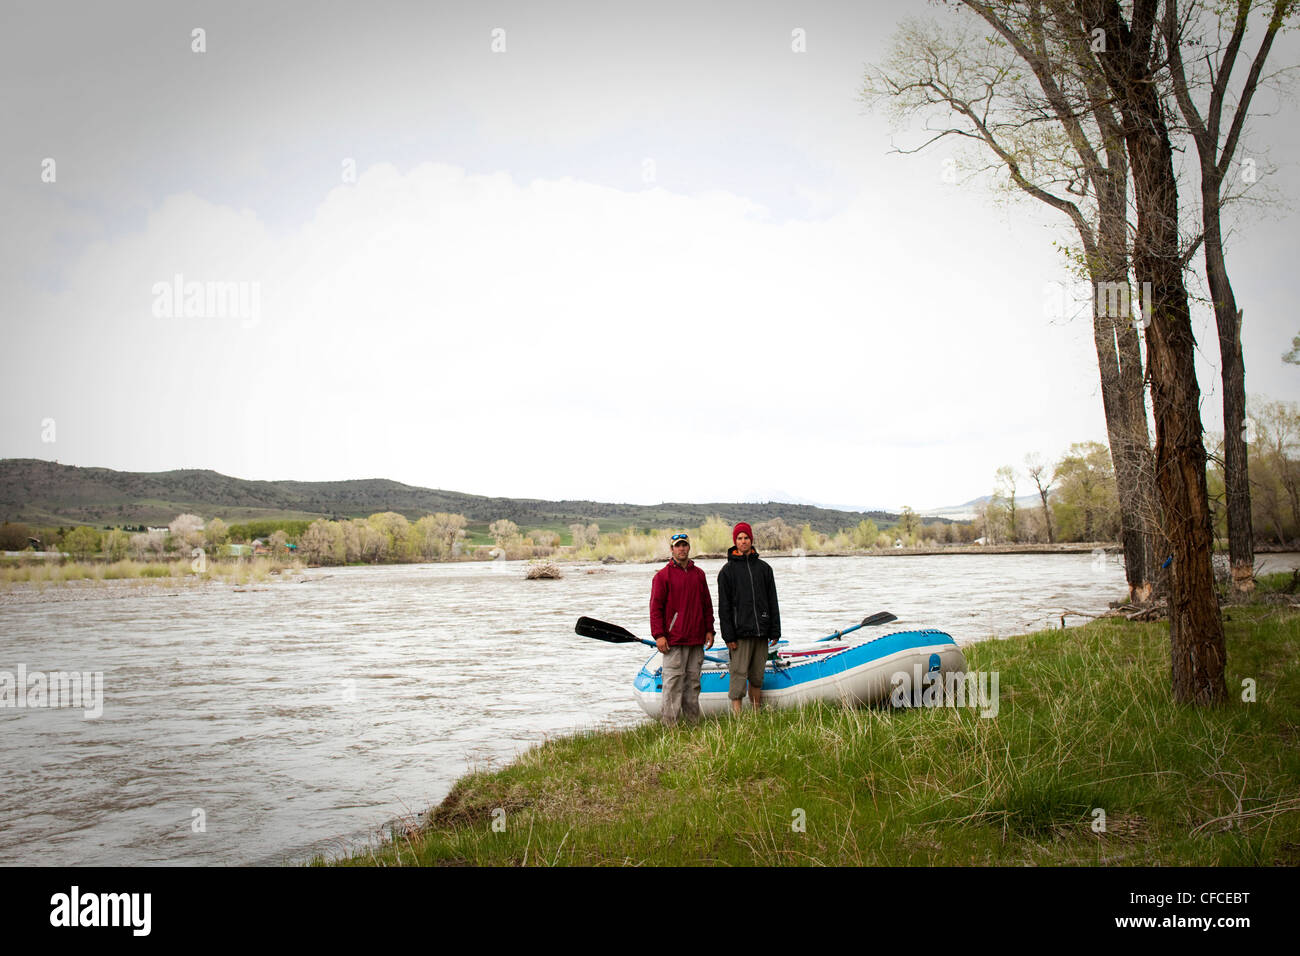 Dos hombres stand by hay balsa en Montana. Imagen De Stock